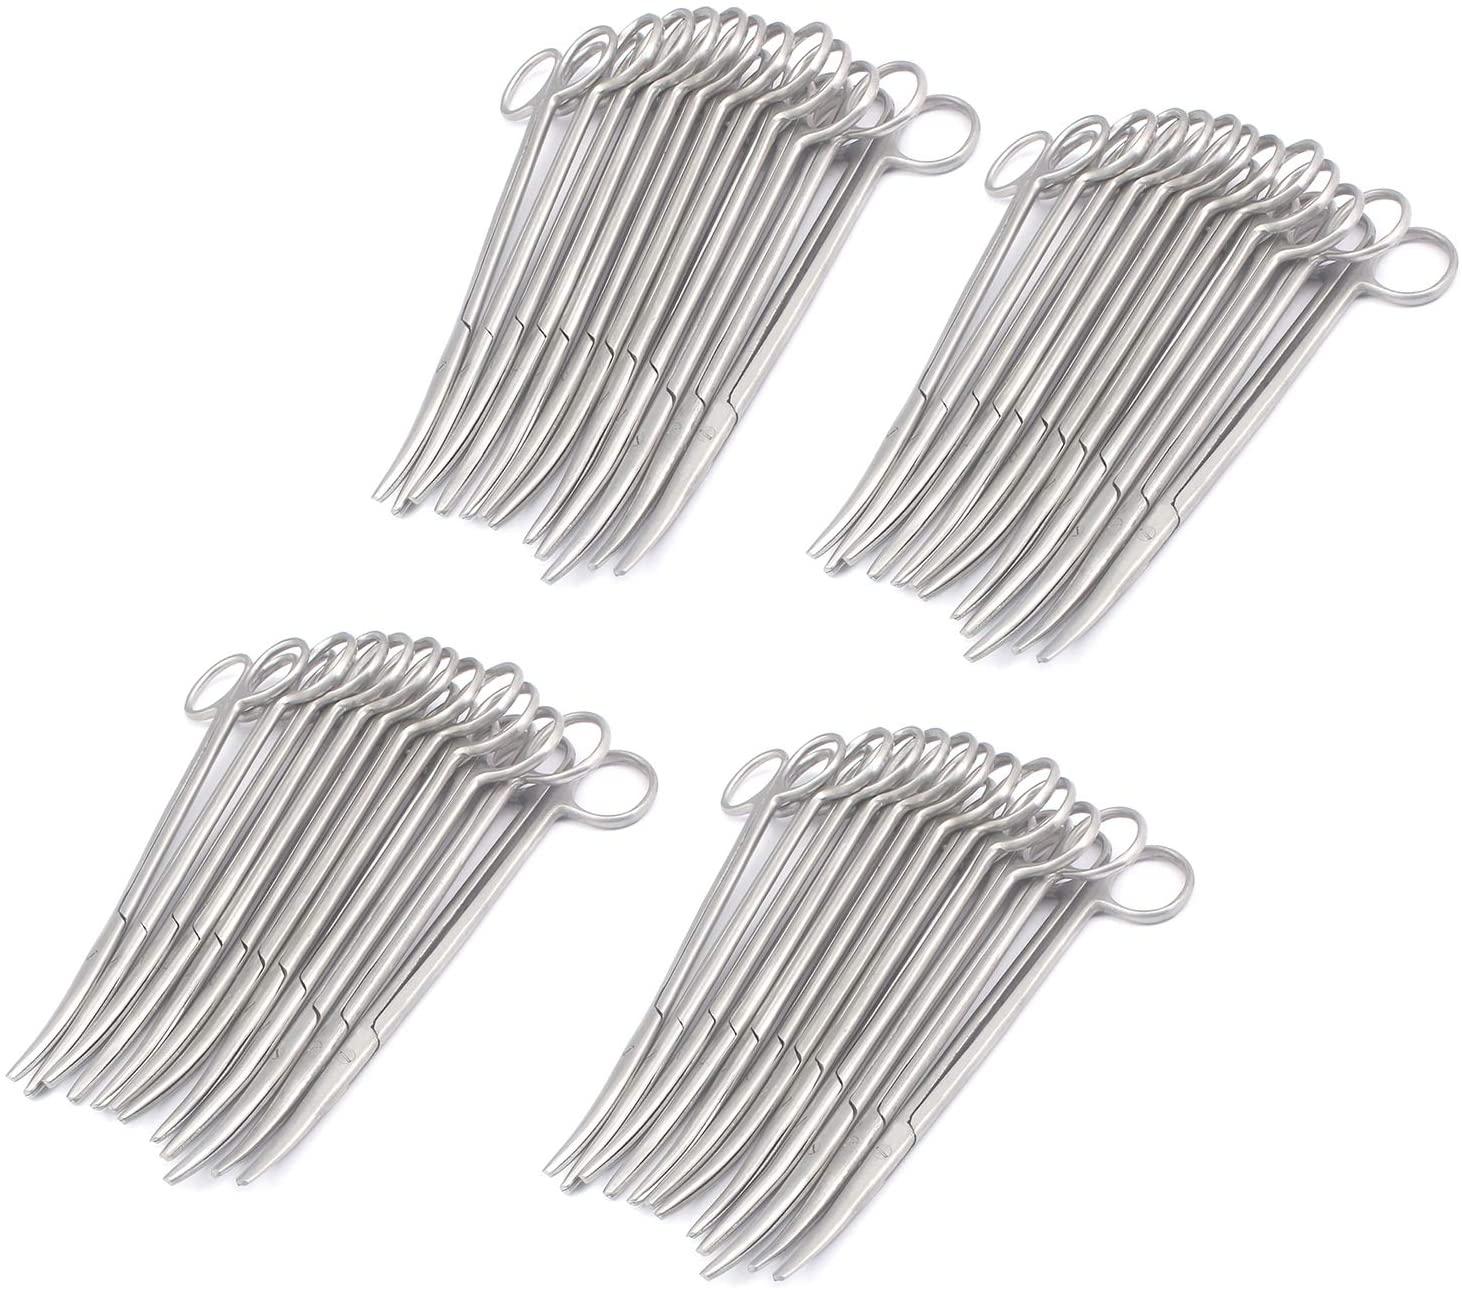 "DDP Set of 50 METZENBAUM Scissors 7"" Curved Stainless Steel"